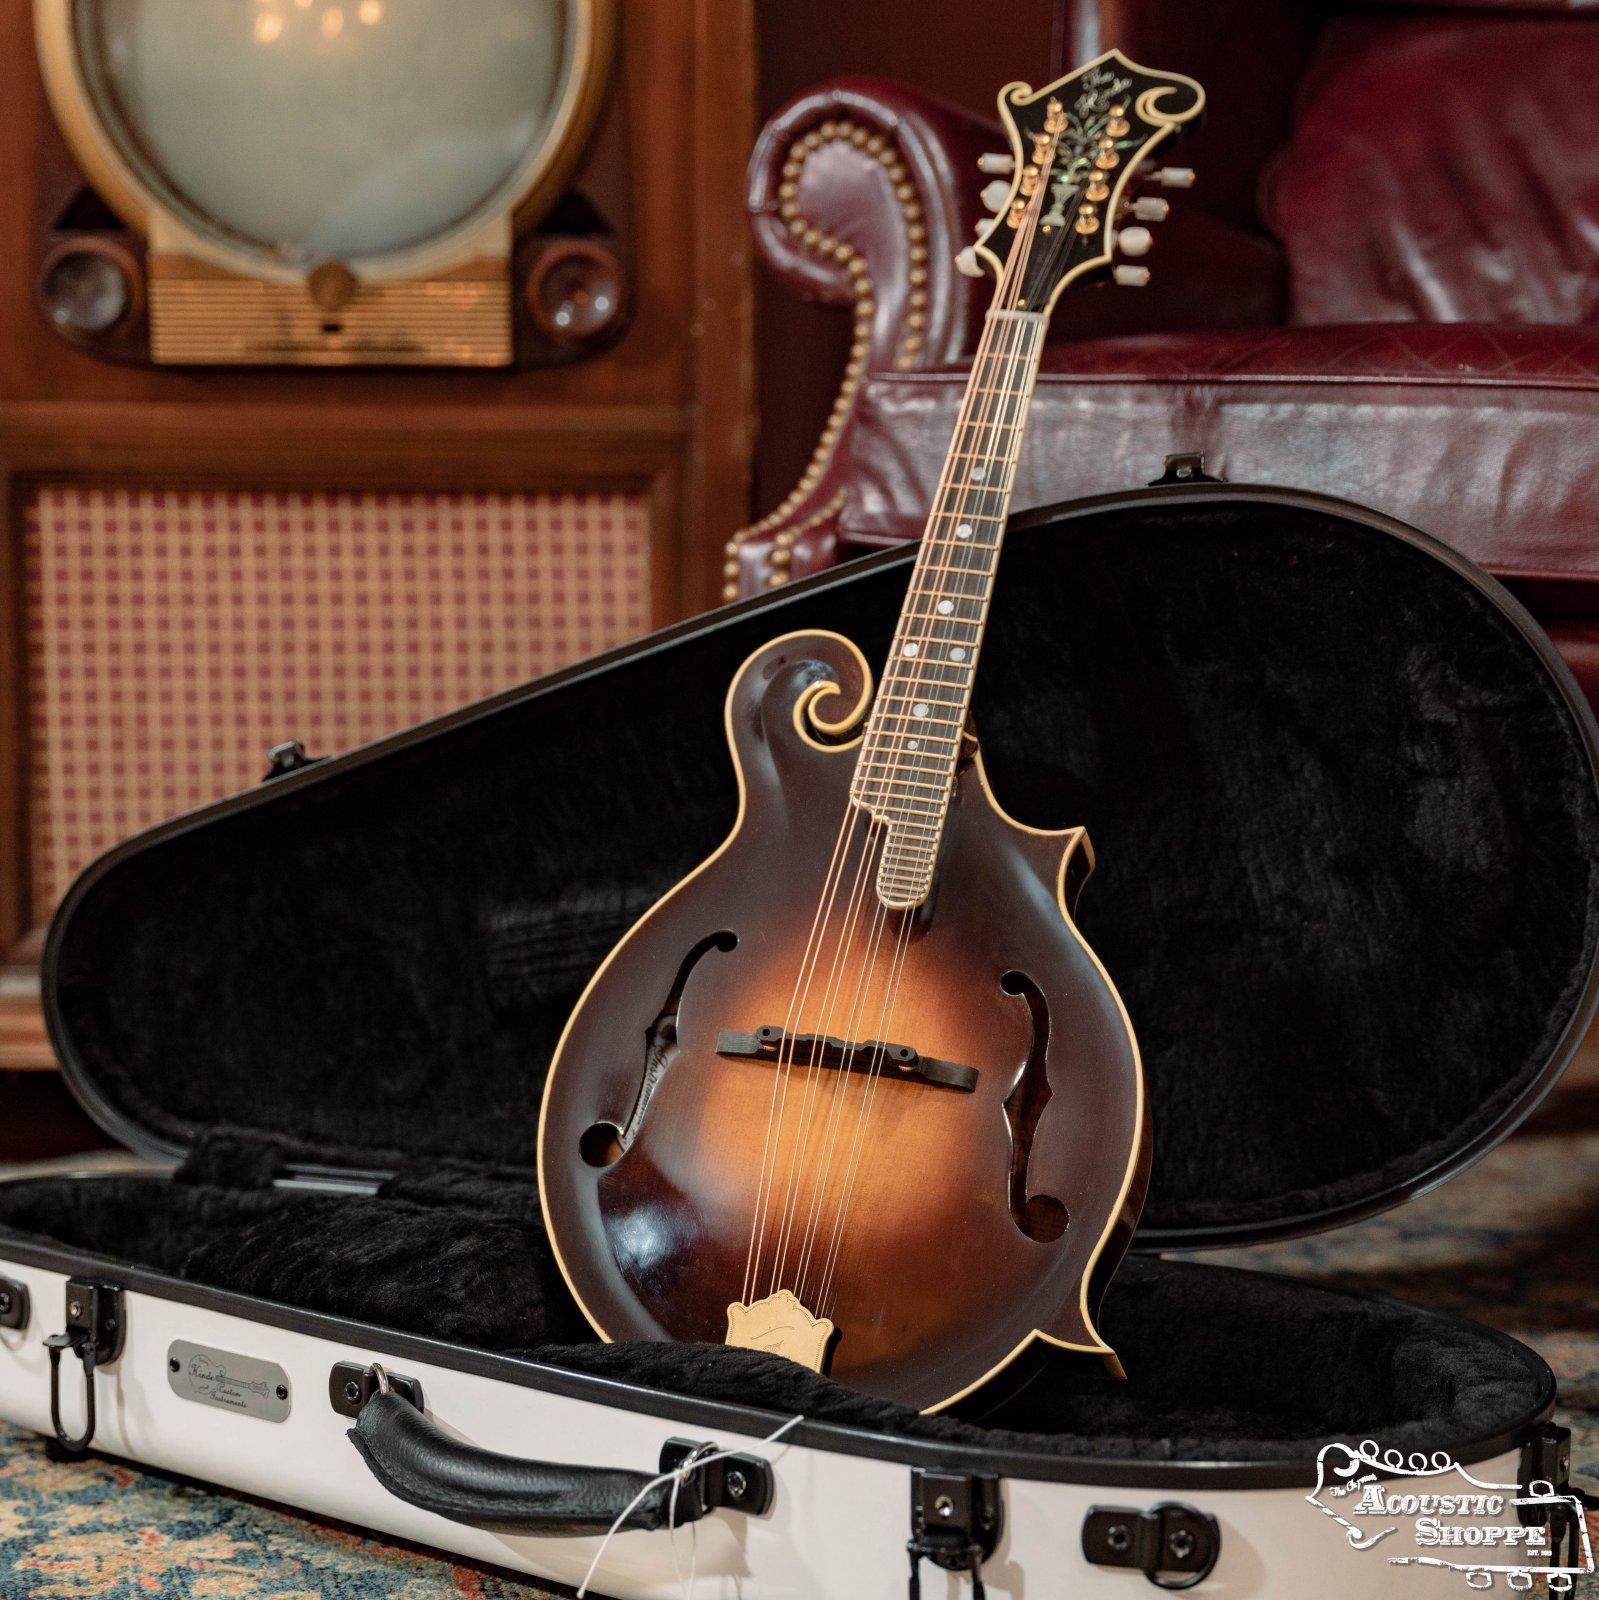 Hinde MF Heritage F Mandolin Red Spruce/Torrefied Maple #MF 47